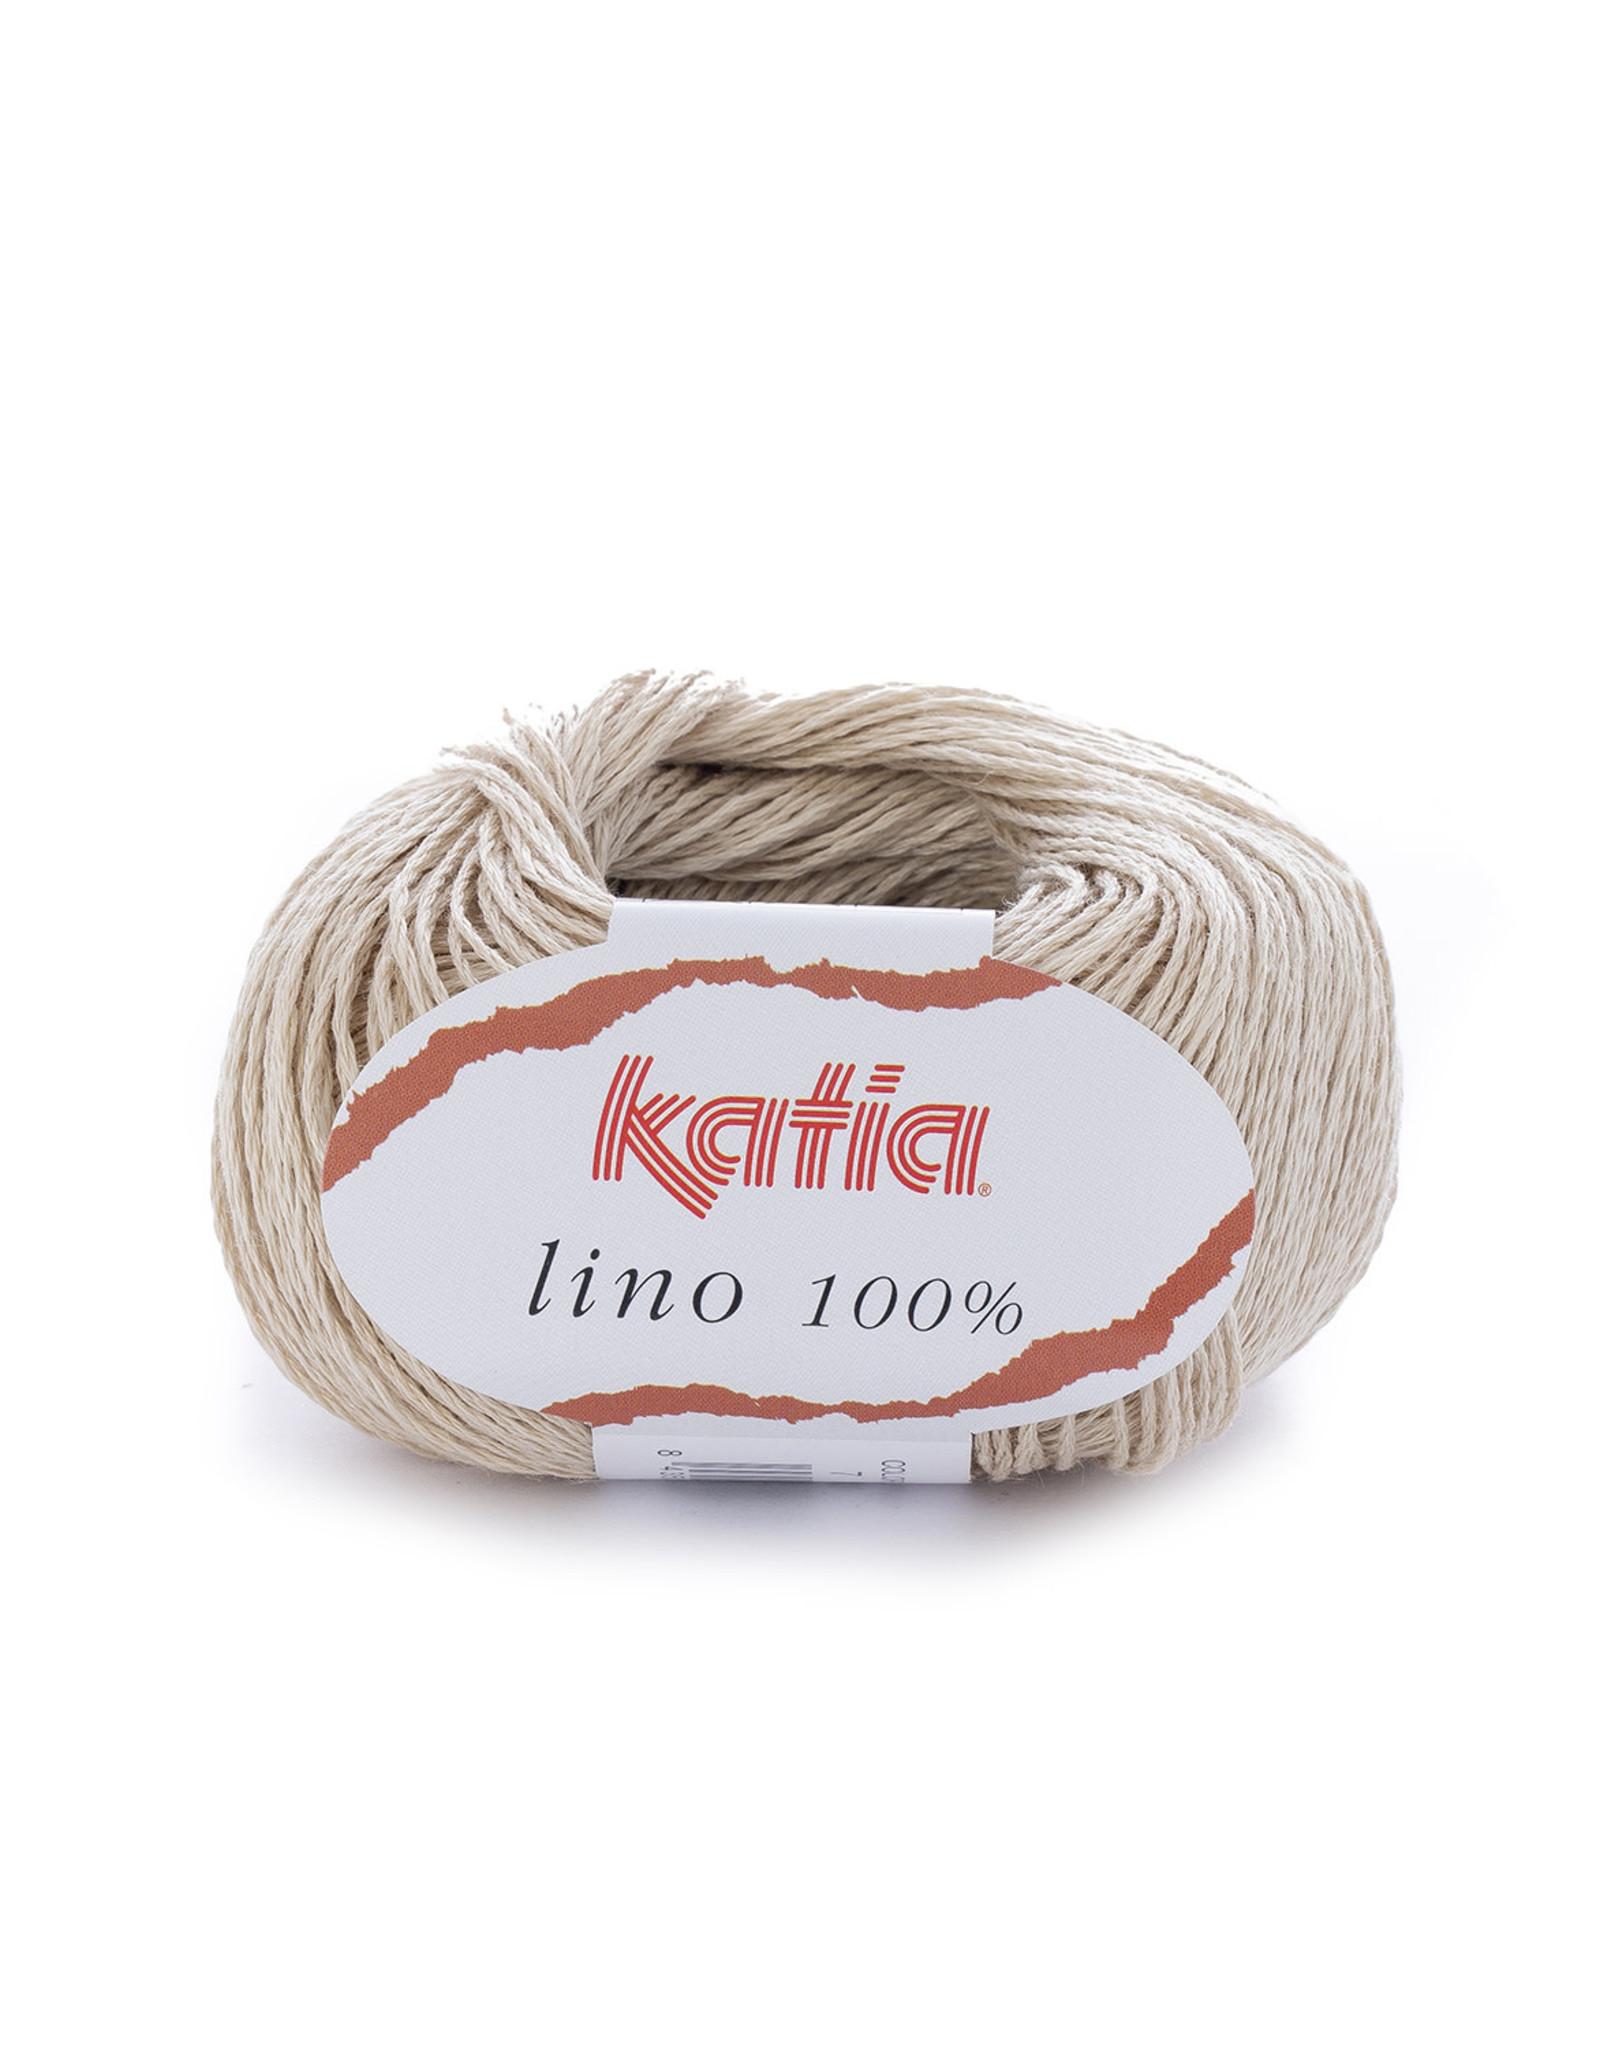 Katia Katia Lino 100% 7 licht beige